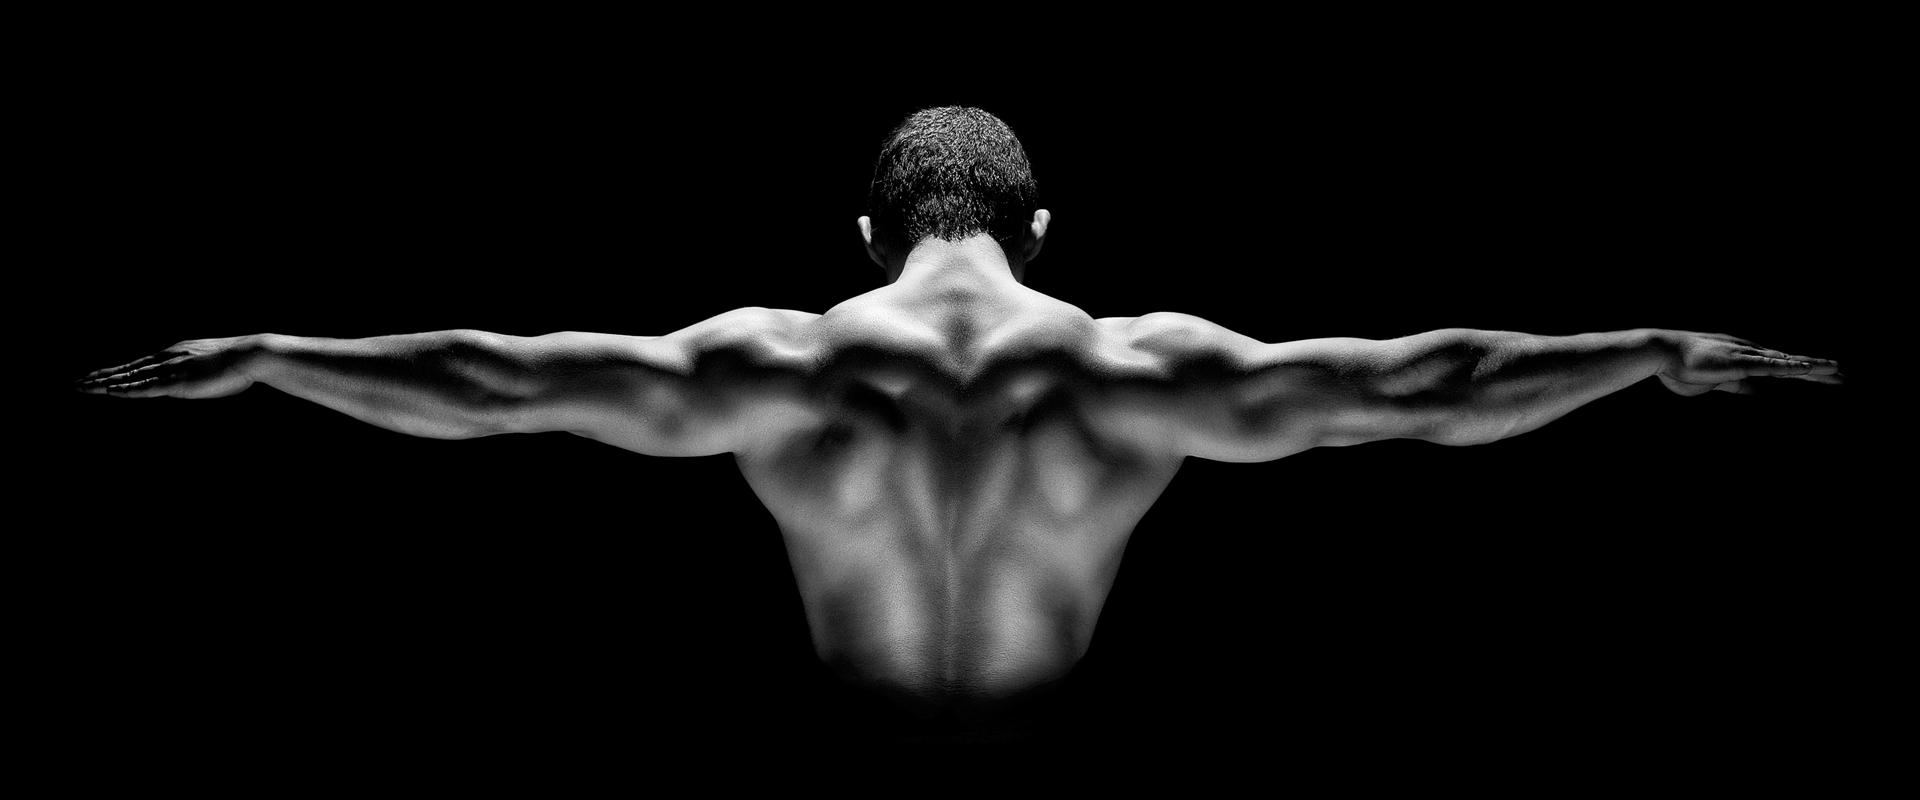 Rehab 2 Fitness